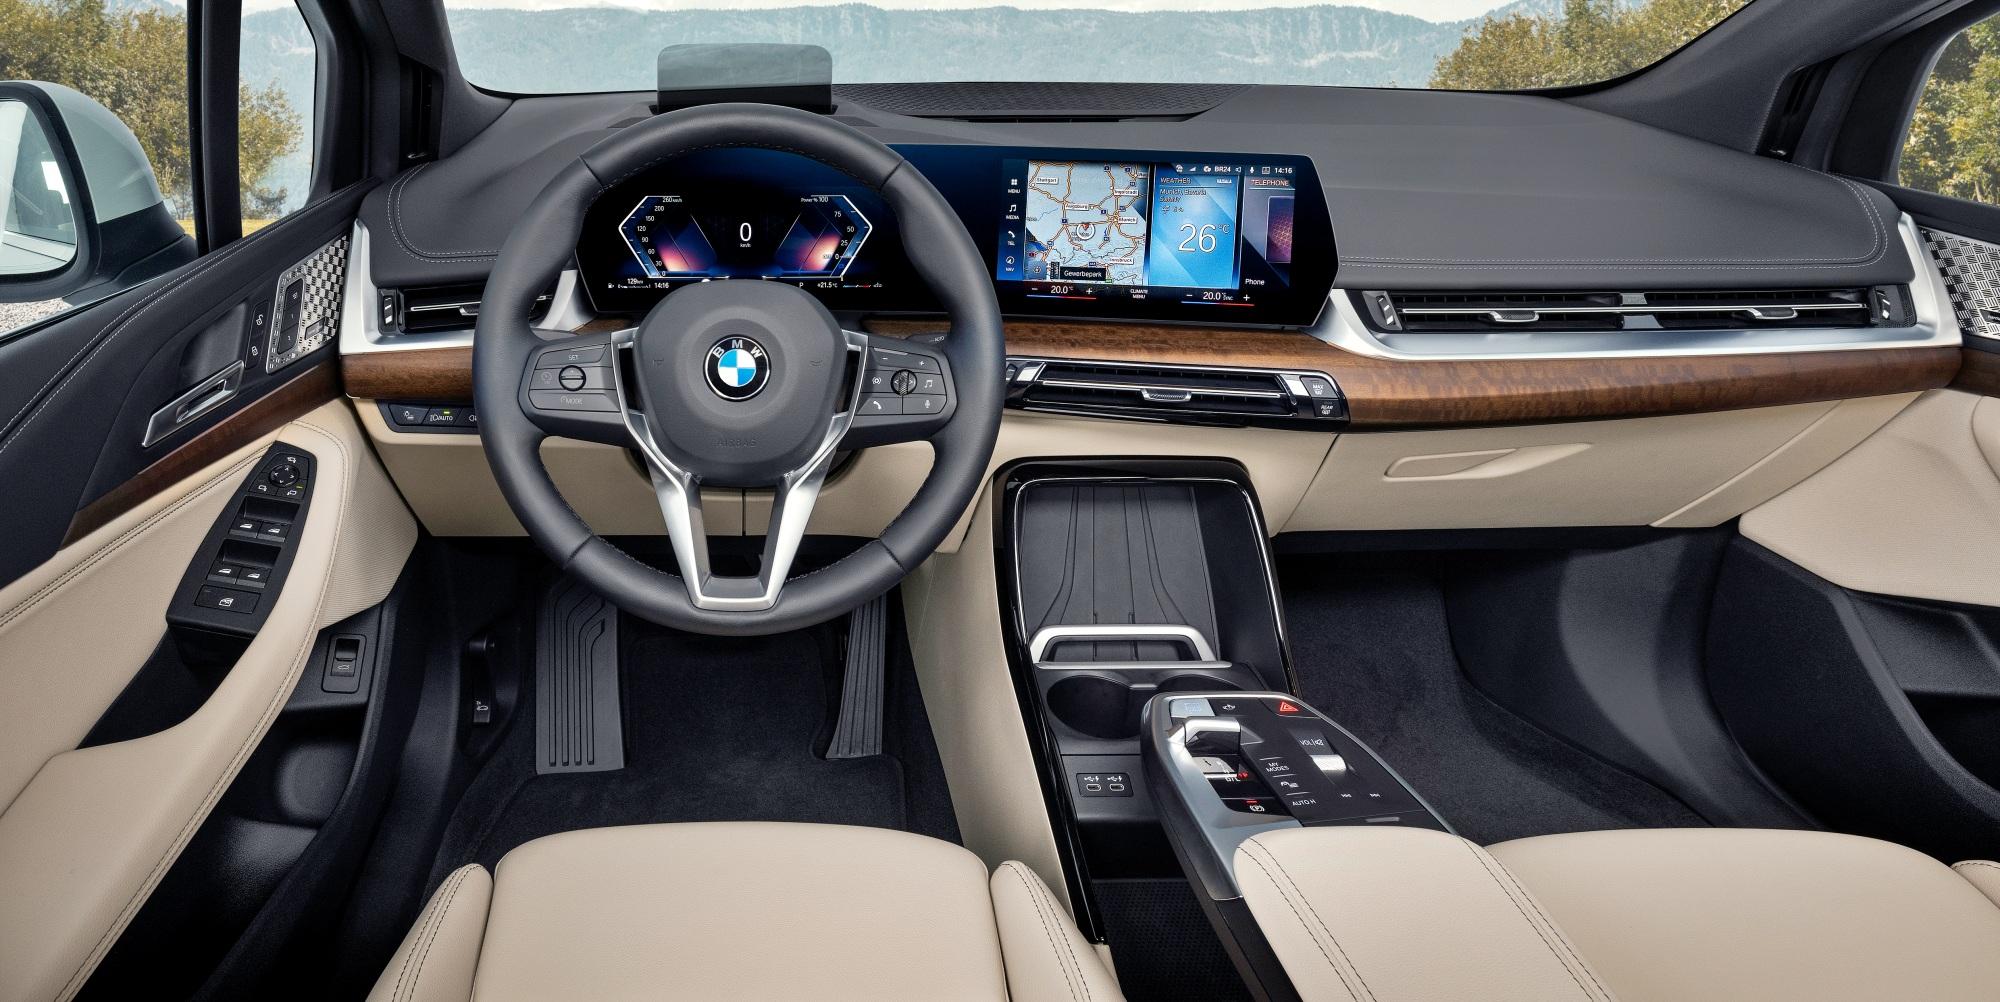 BMW serii 2 Active Tourer deska